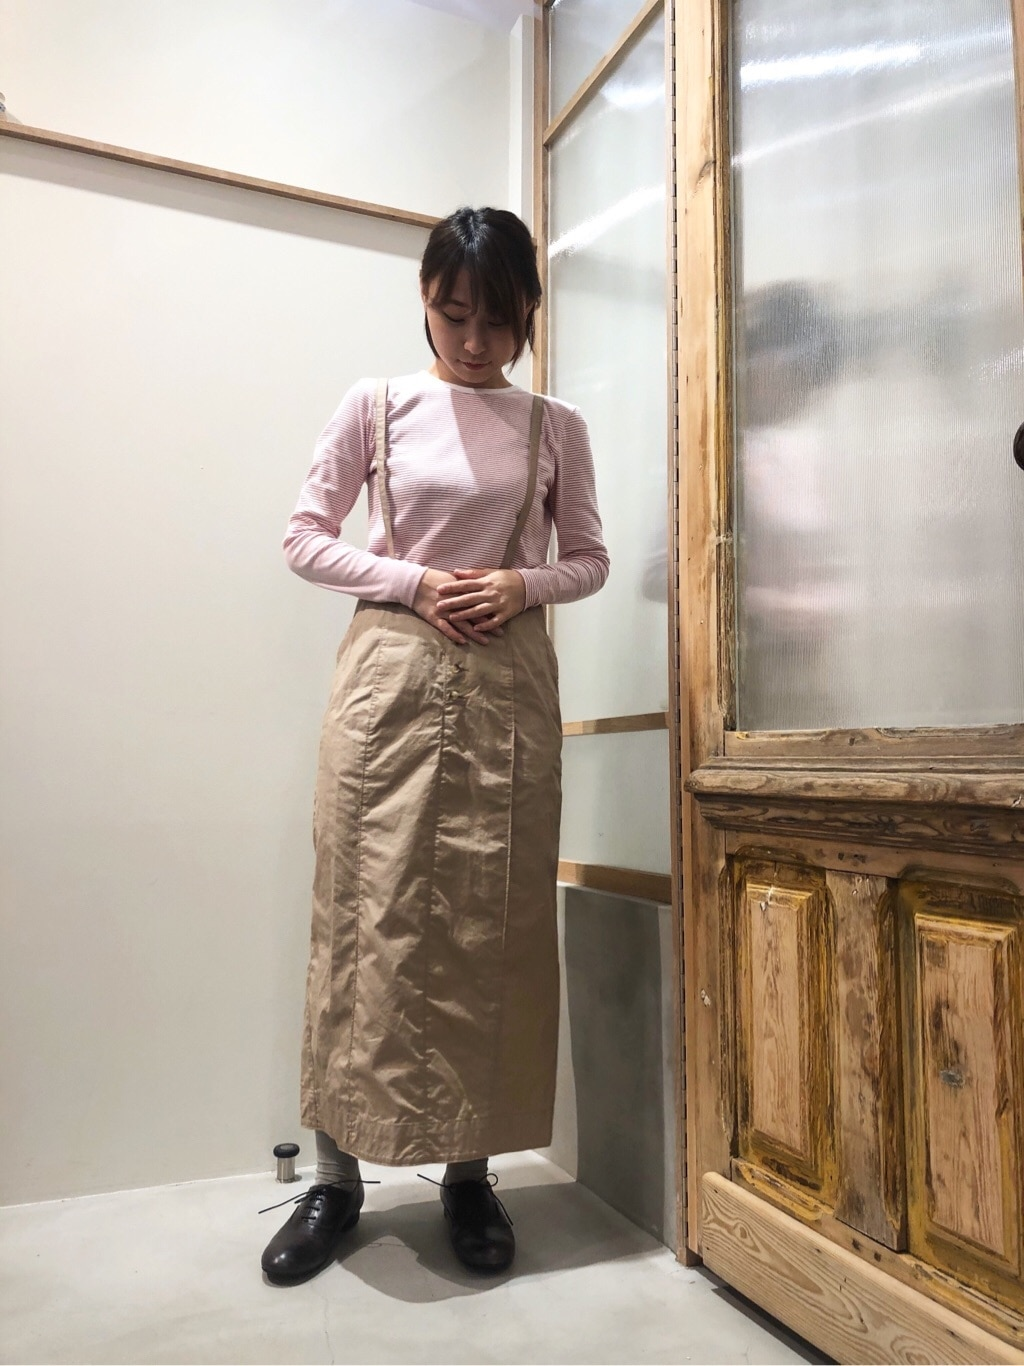 bulle de savon 渋谷スクランブルスクエア 身長:159cm 2020.03.23